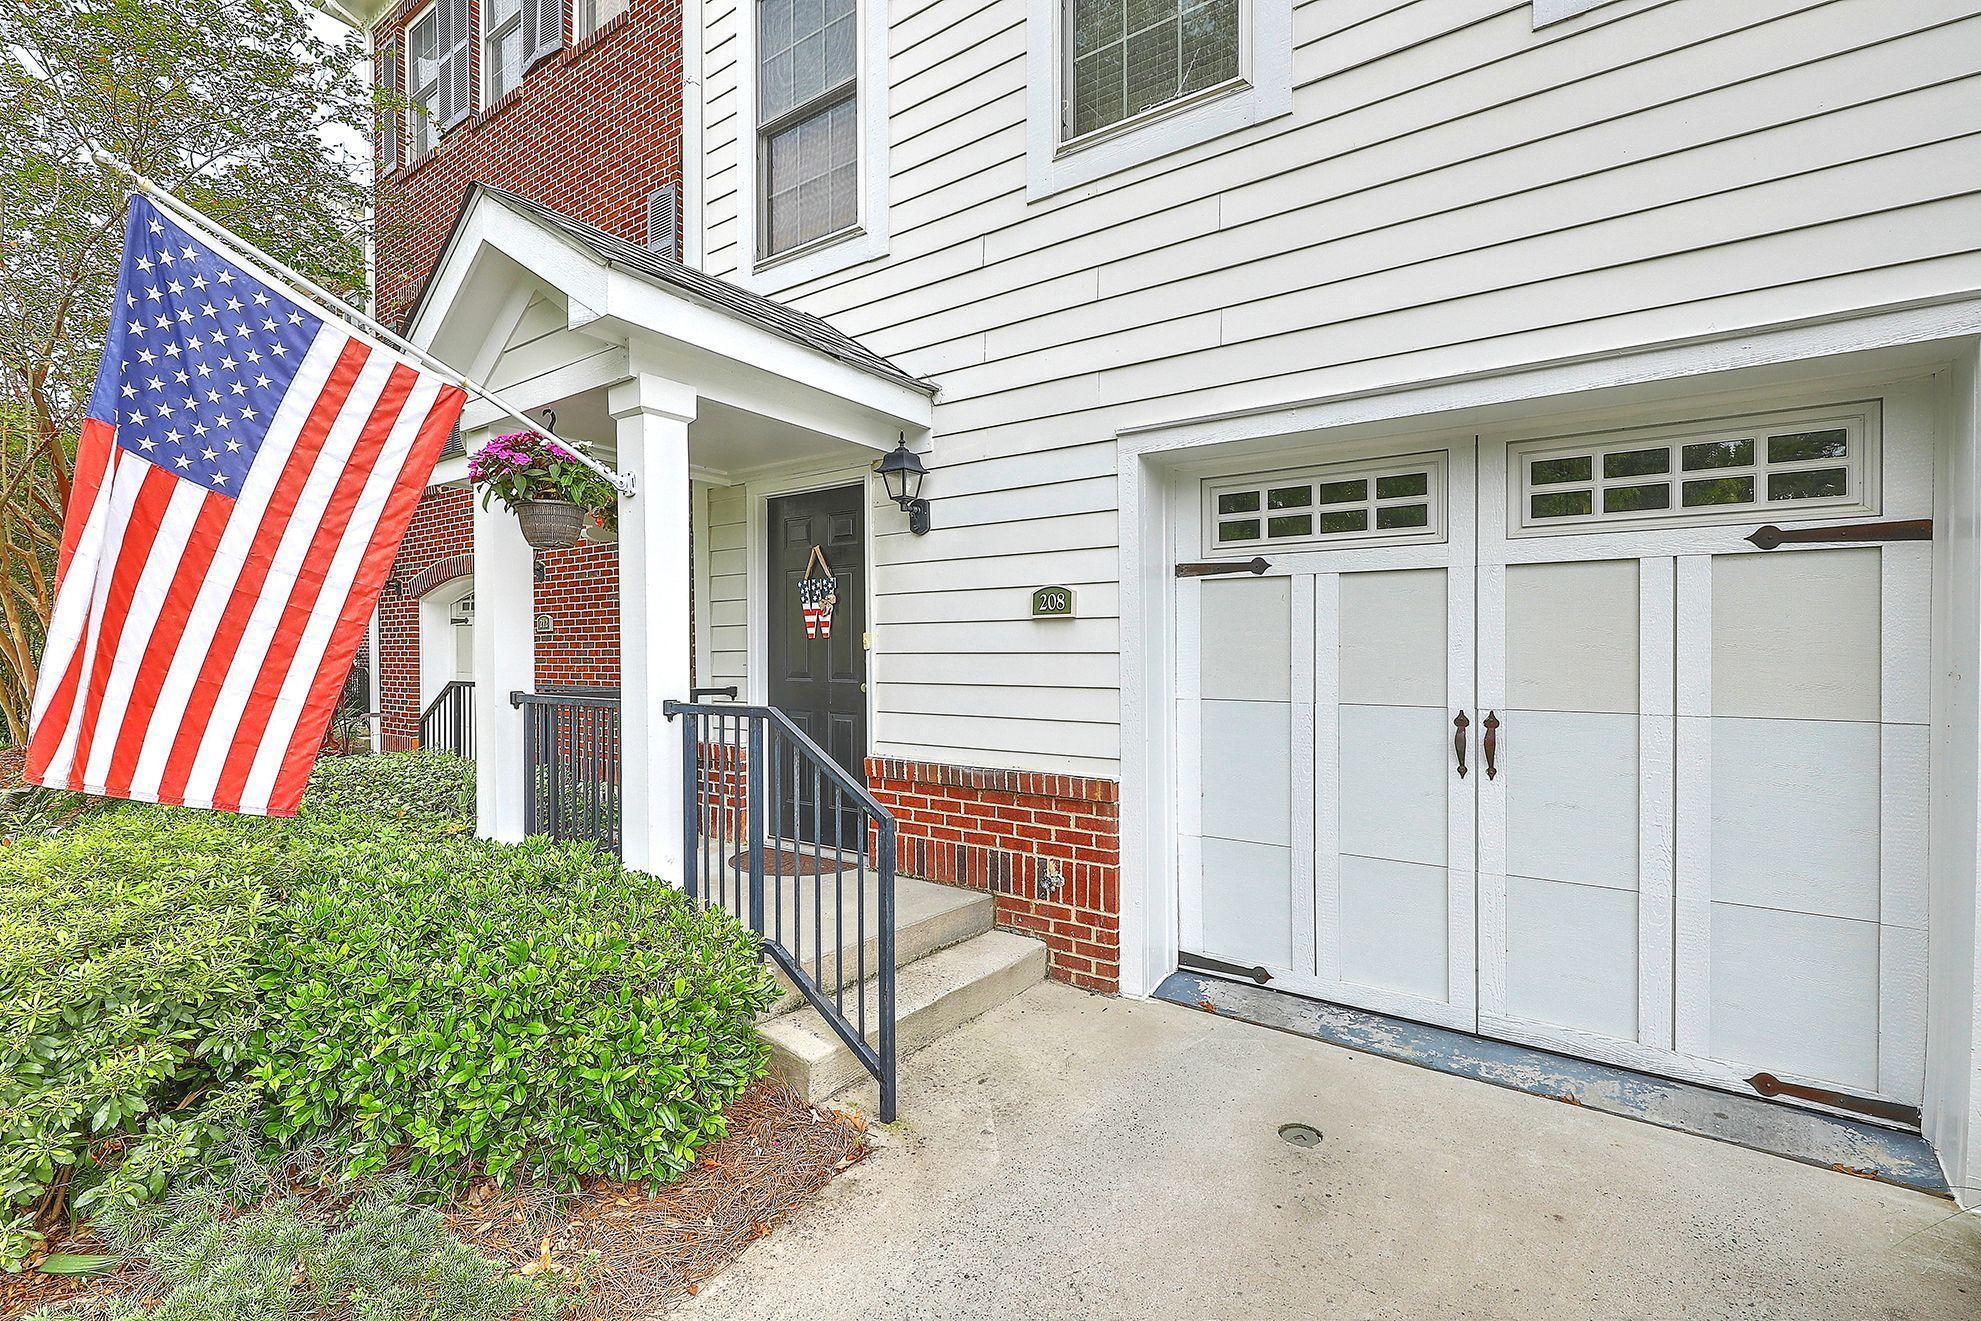 Etiwan Pointe Homes For Sale - 208 Etiwan Pointe, Mount Pleasant, SC - 27